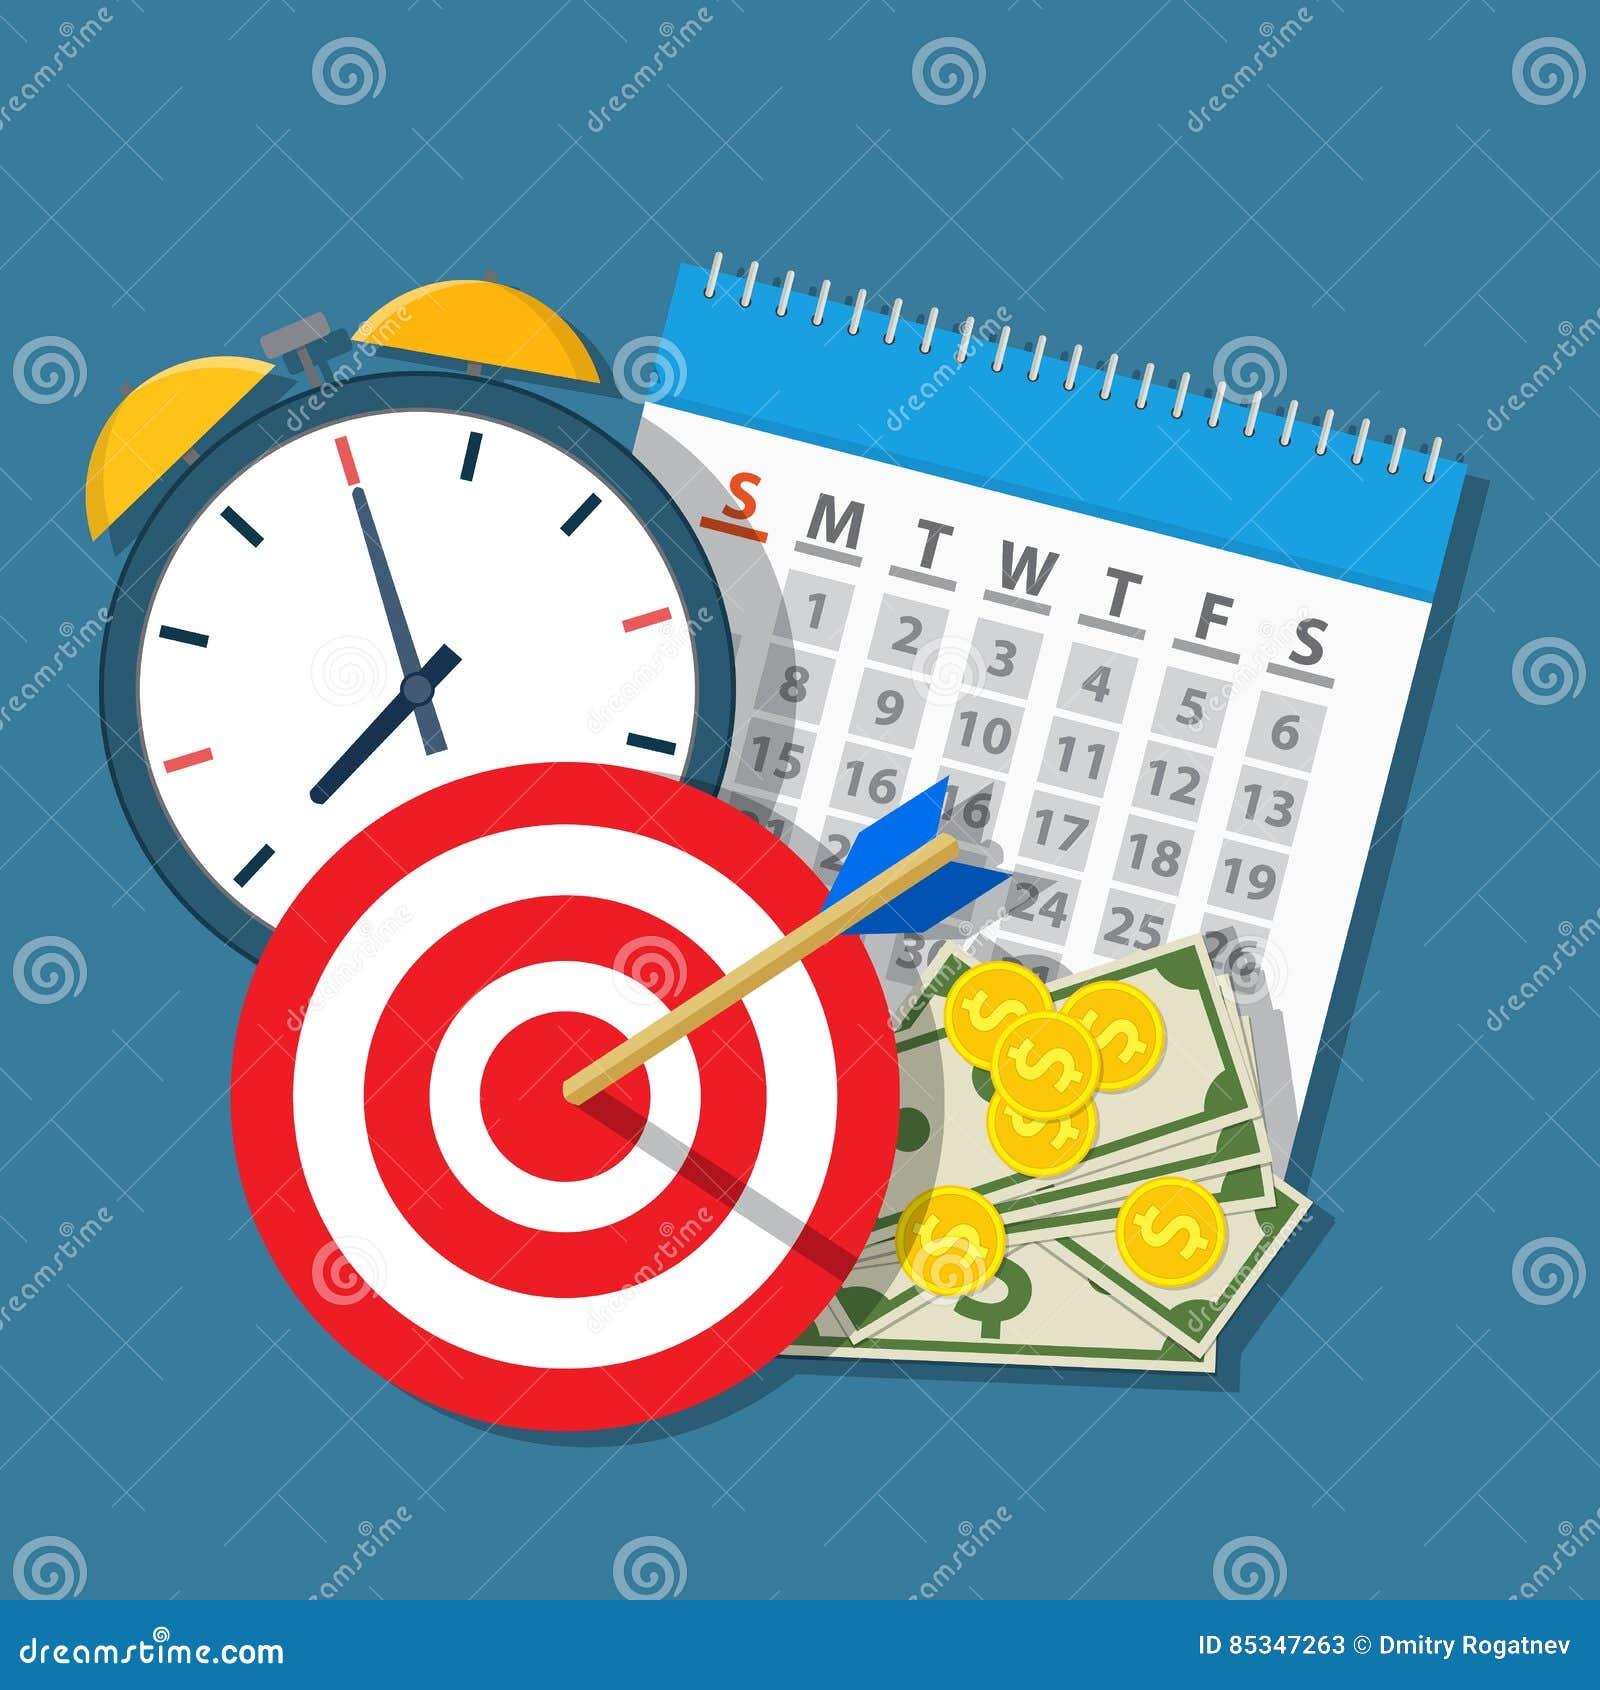 Calendar Planner Target : Alarm clock calendar target money stock vector illustration of